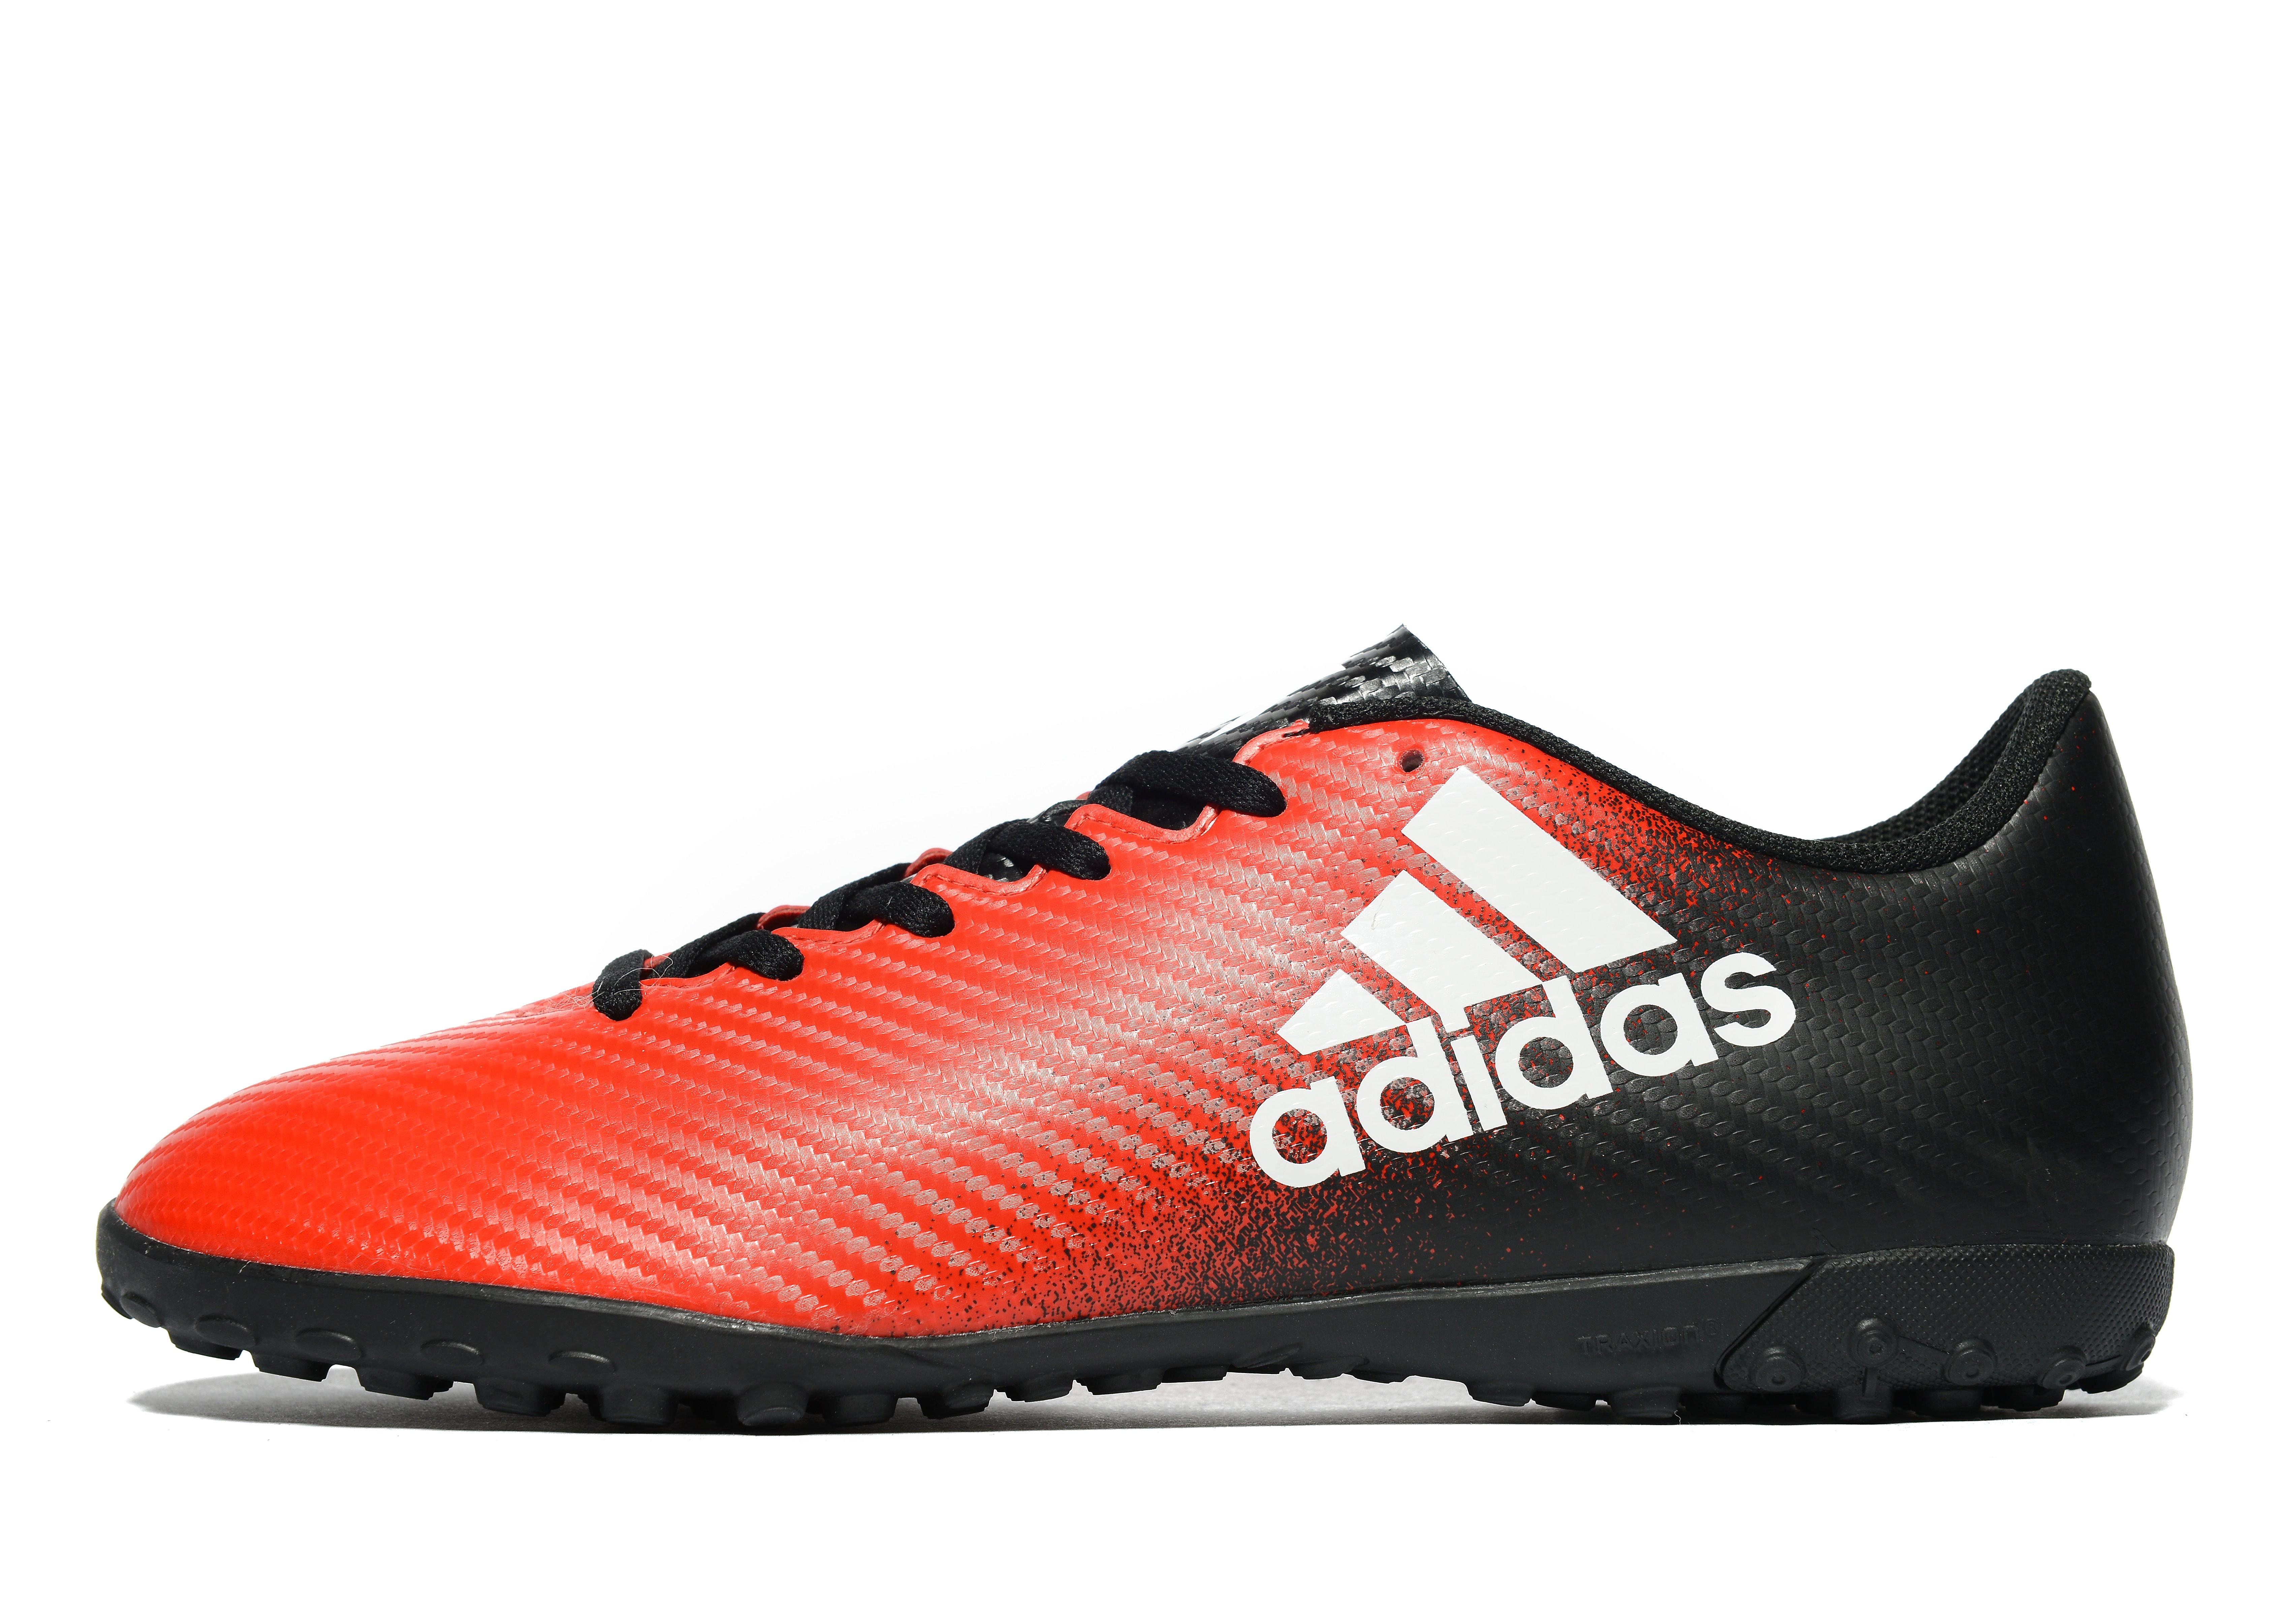 adidas Red Limit X 16.4 Turf